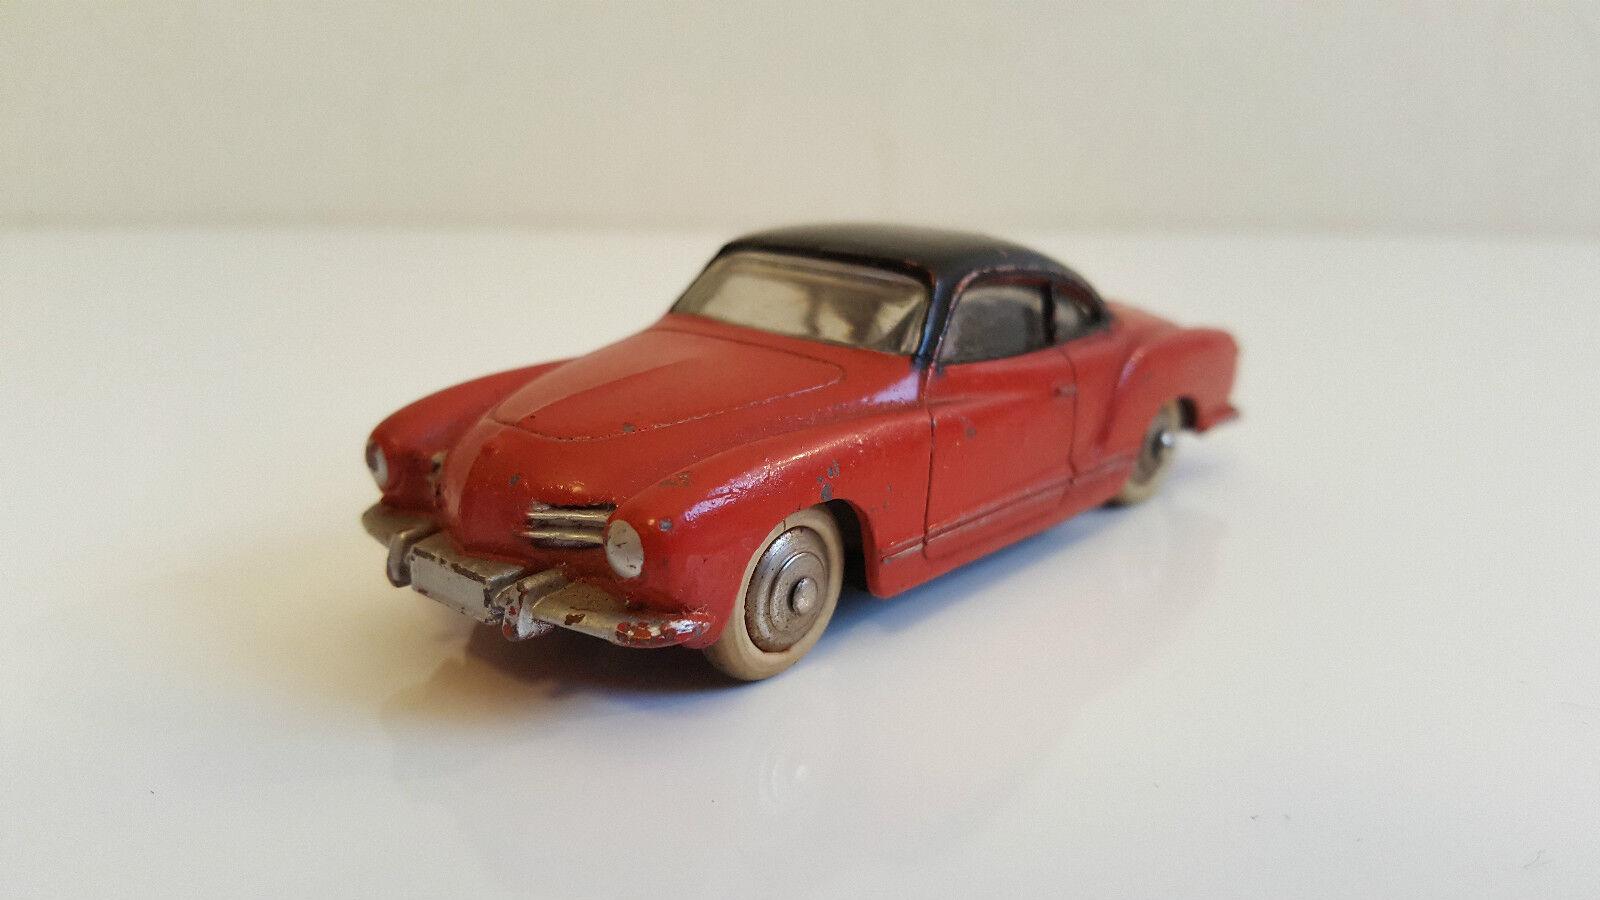 Dinky Toys - 24 M - Volkswagen Karmann-Ghia